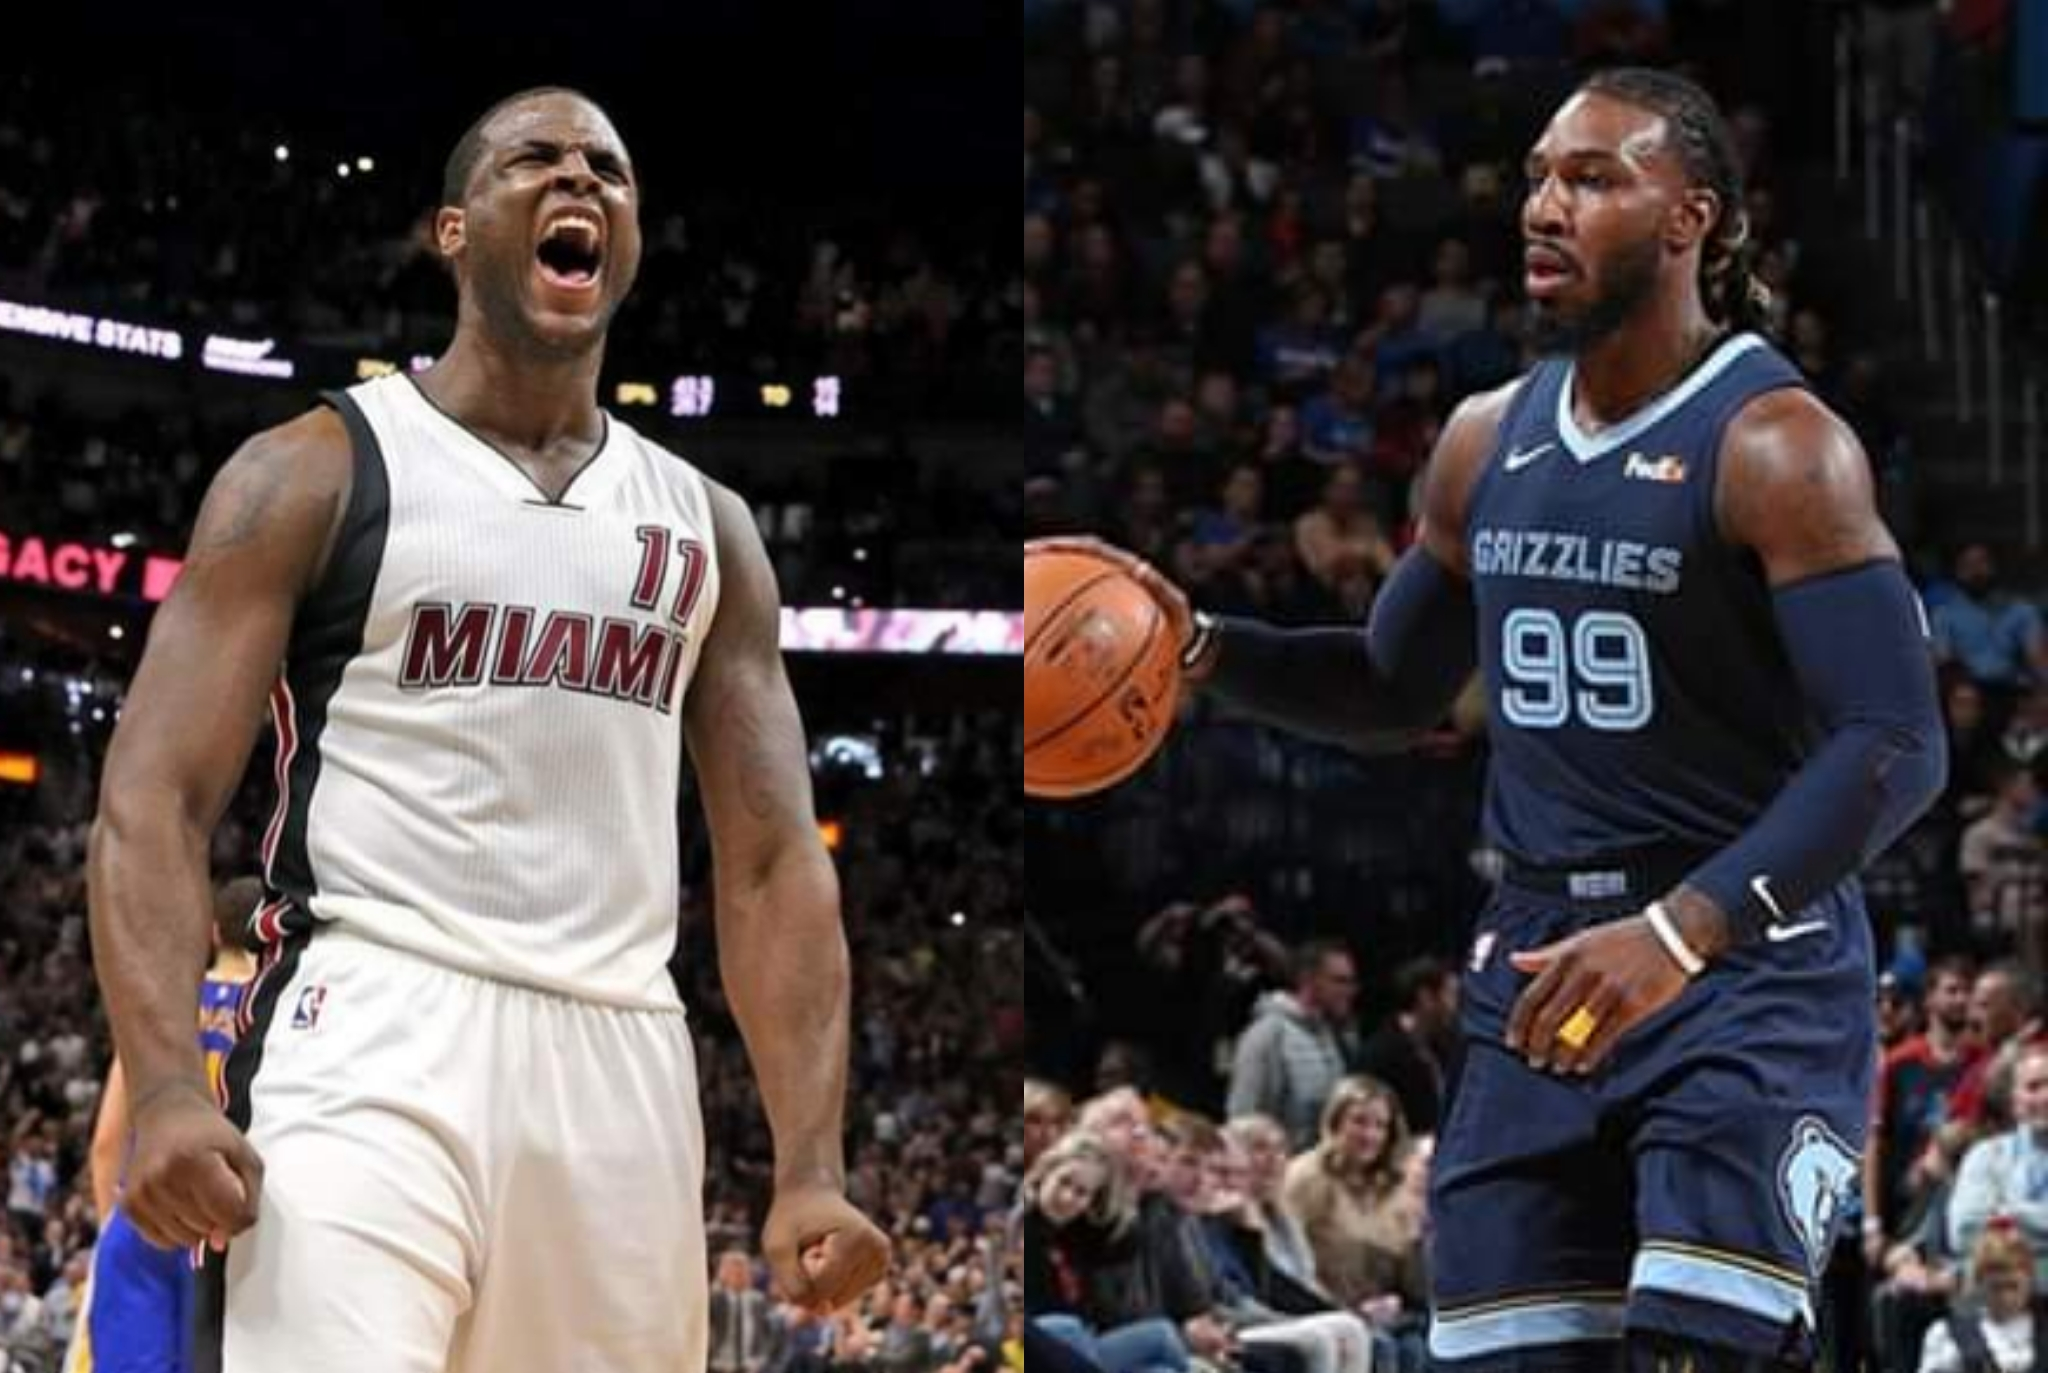 NBA trade: Dion Waiters, Jae Crowder part of Heat-Grizzlies Iguodala deal